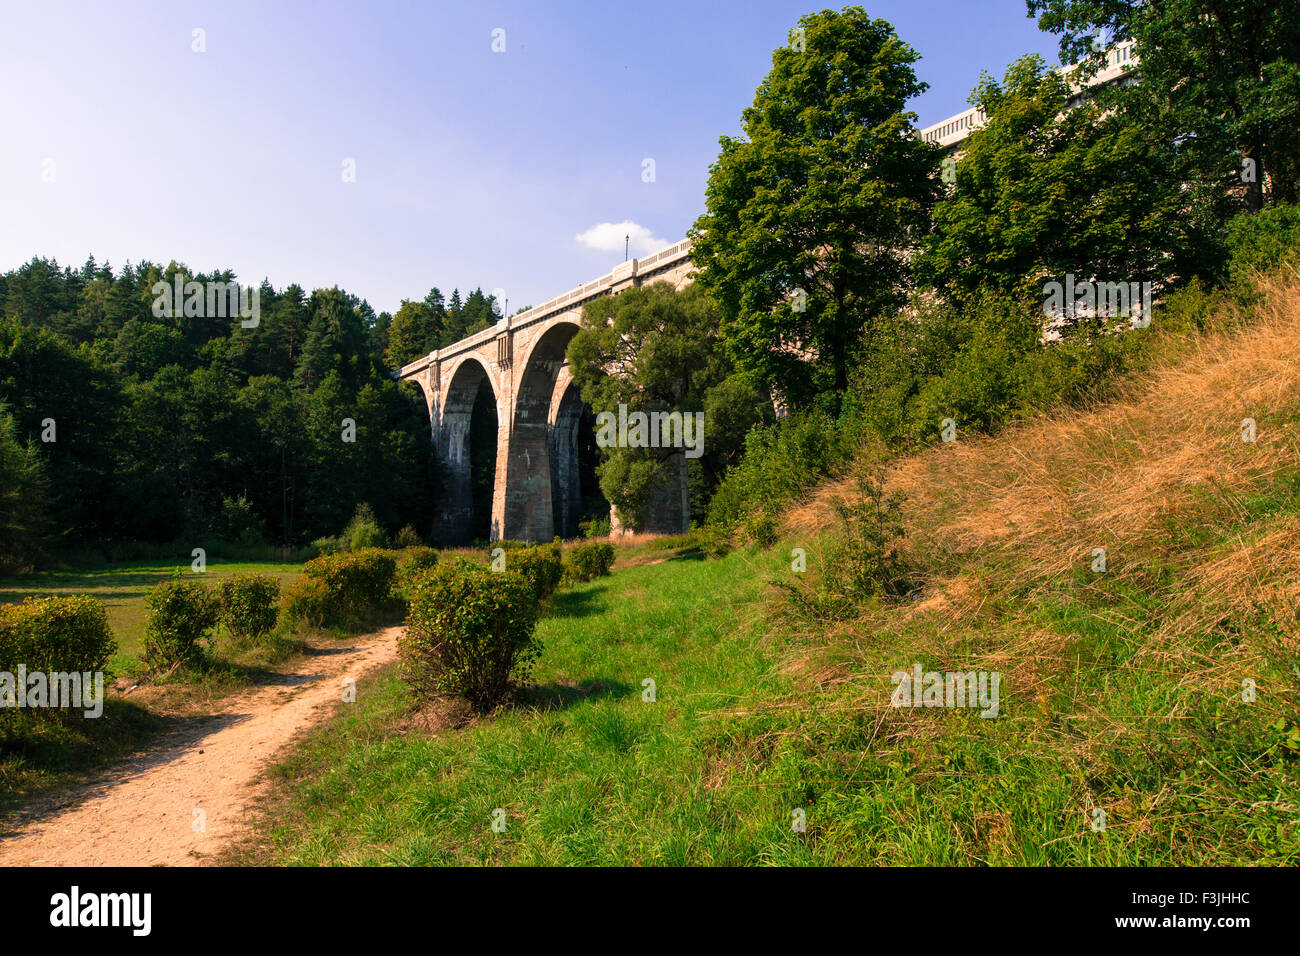 Concrete Railway Bridge Stock Photos Amp Concrete Railway